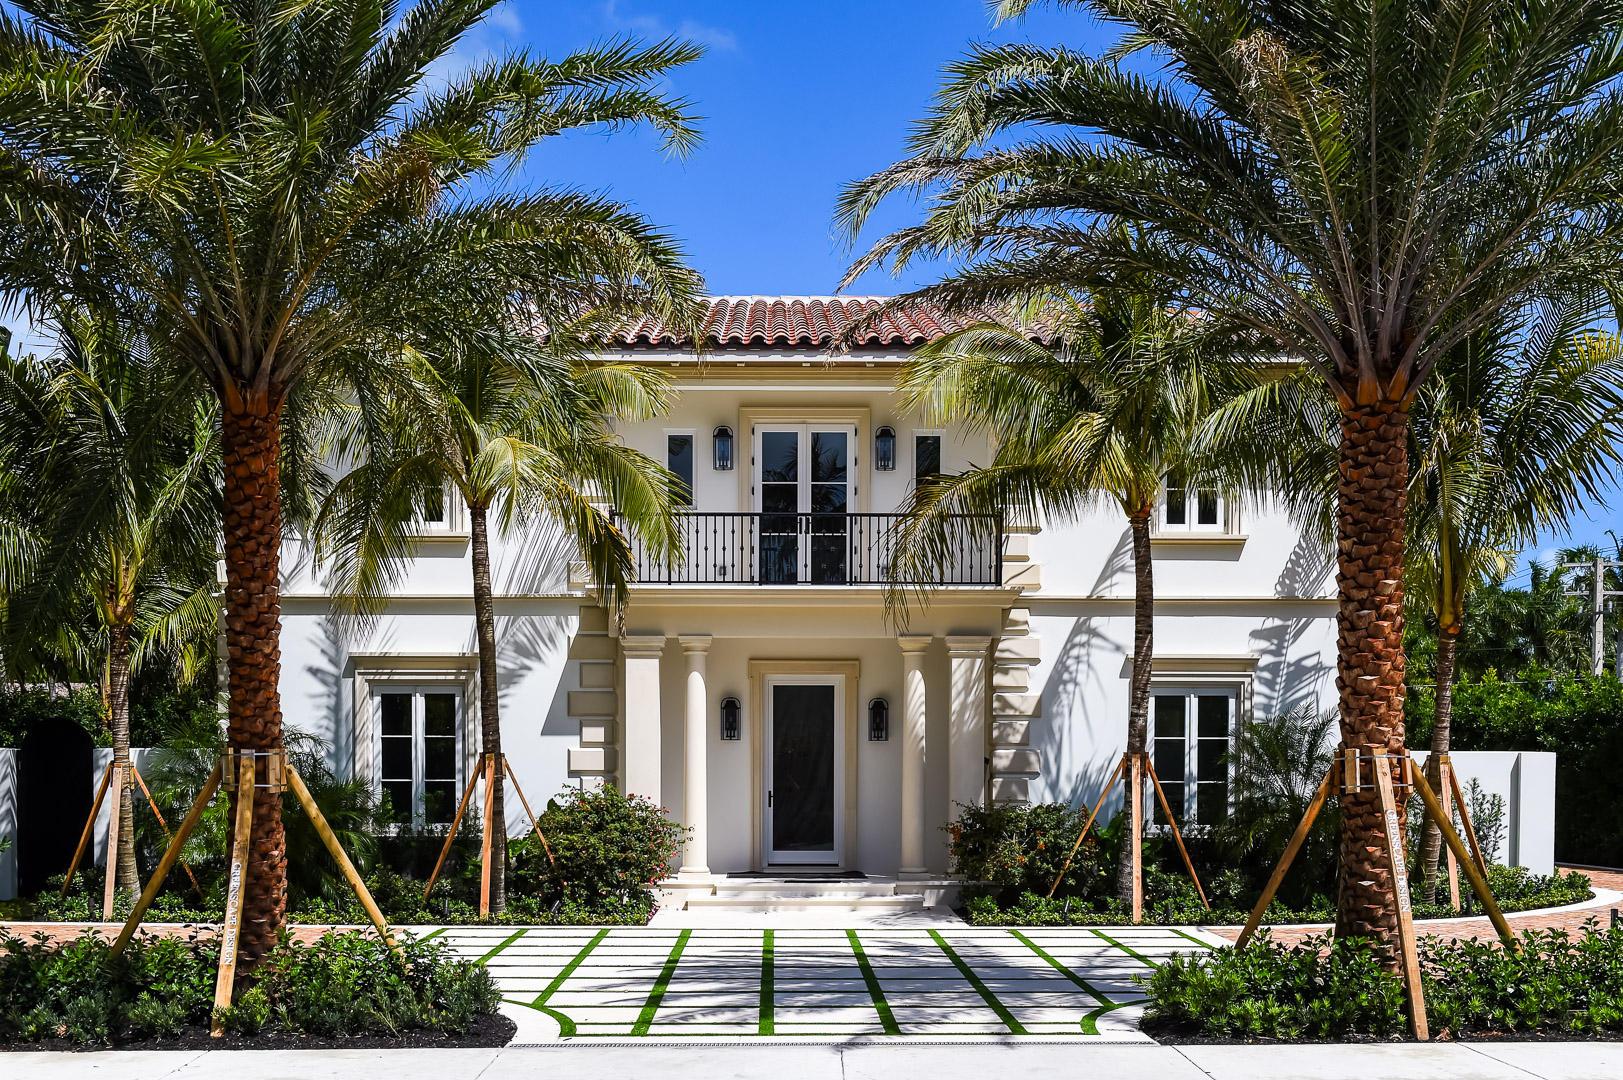 ADAMS PALM BEACH FLORIDA